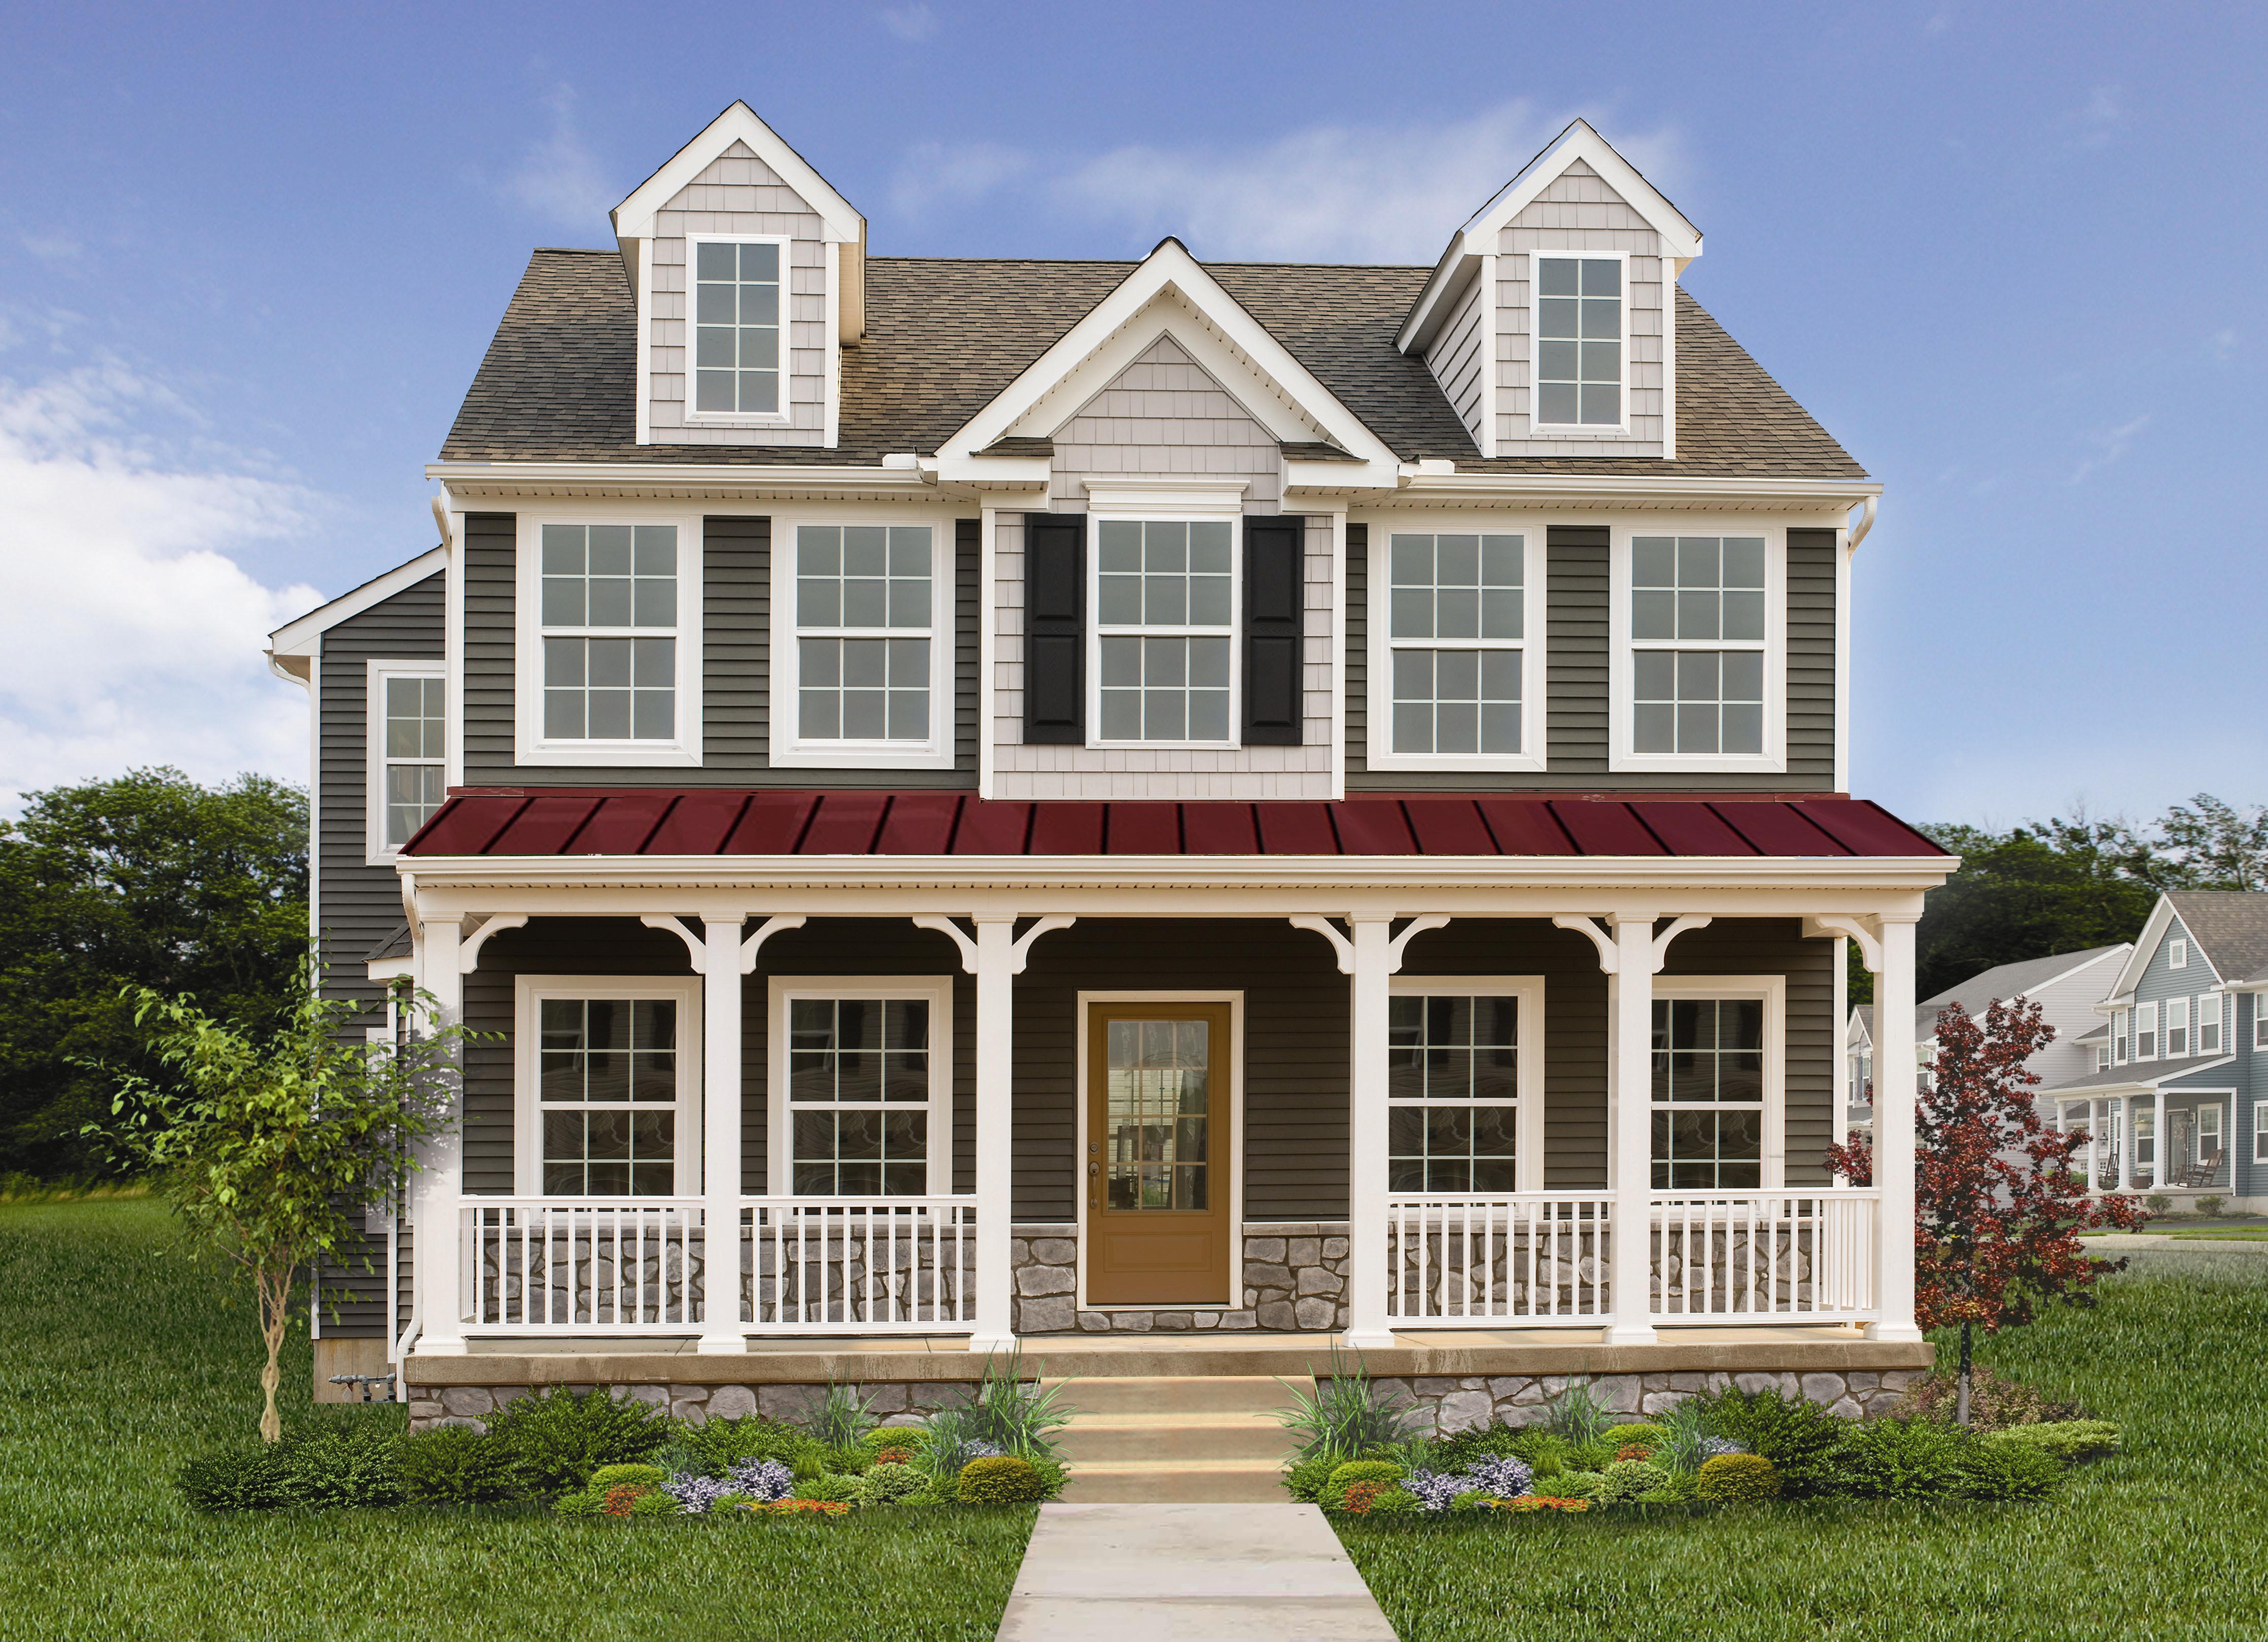 Keystone home builders augusta ga amantha home review for Designer homes augusta ga